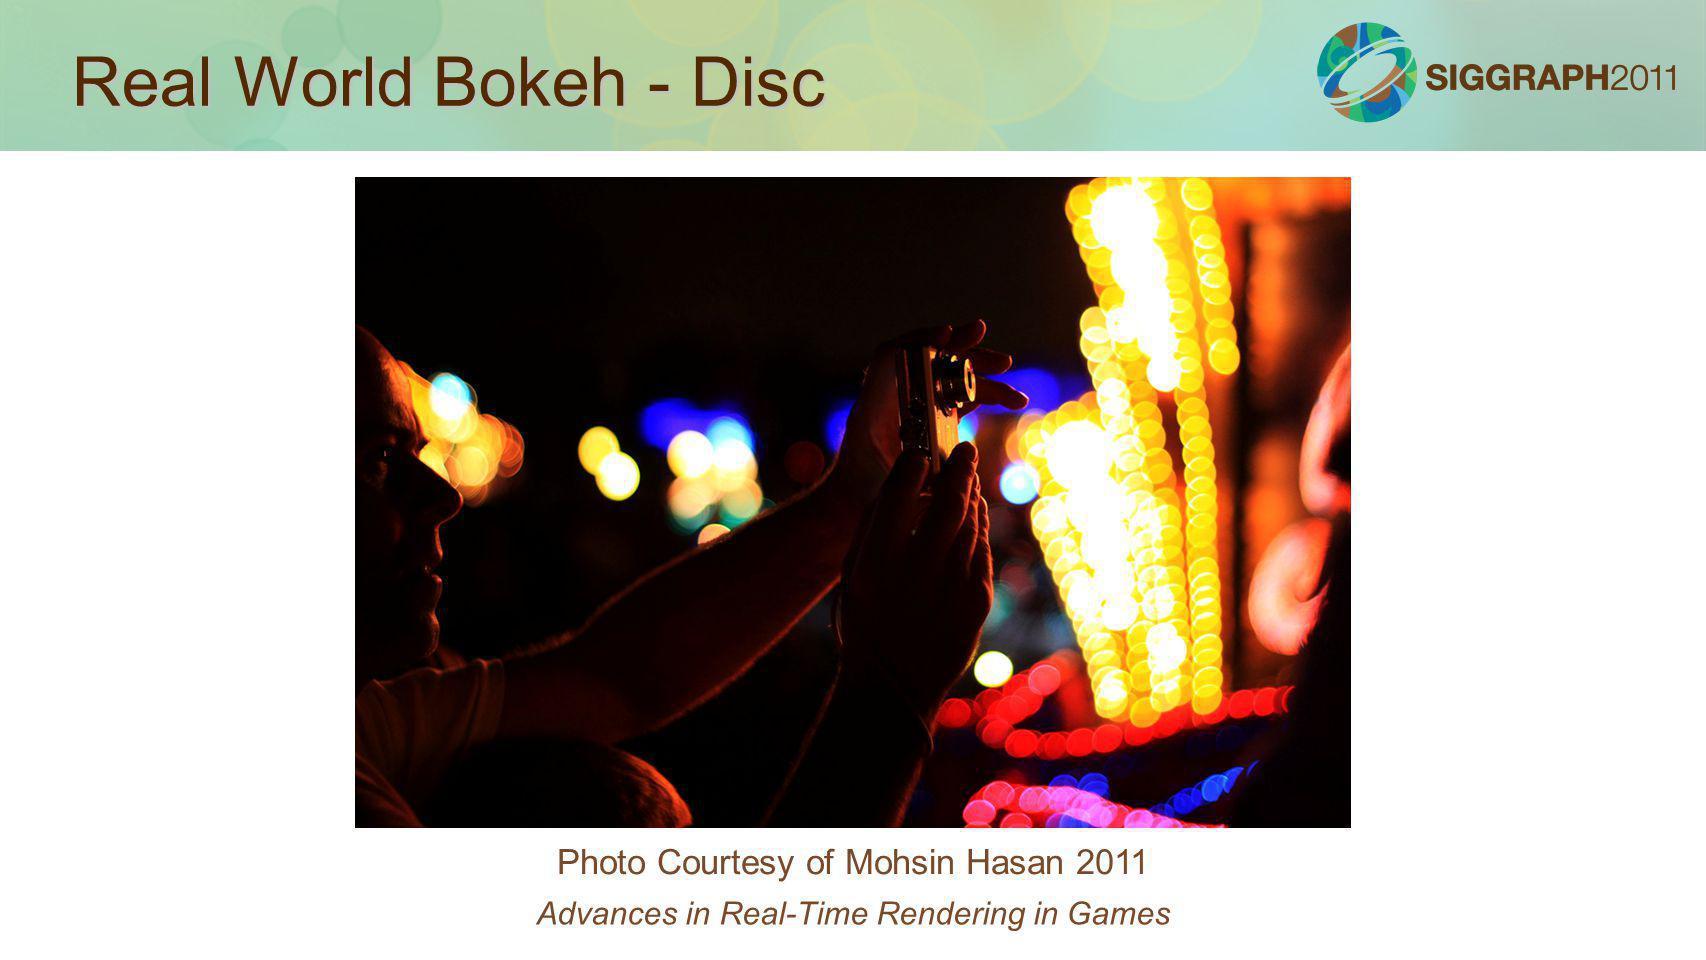 Real World Bokeh - Disc Photo Courtesy of Mohsin Hasan 2011